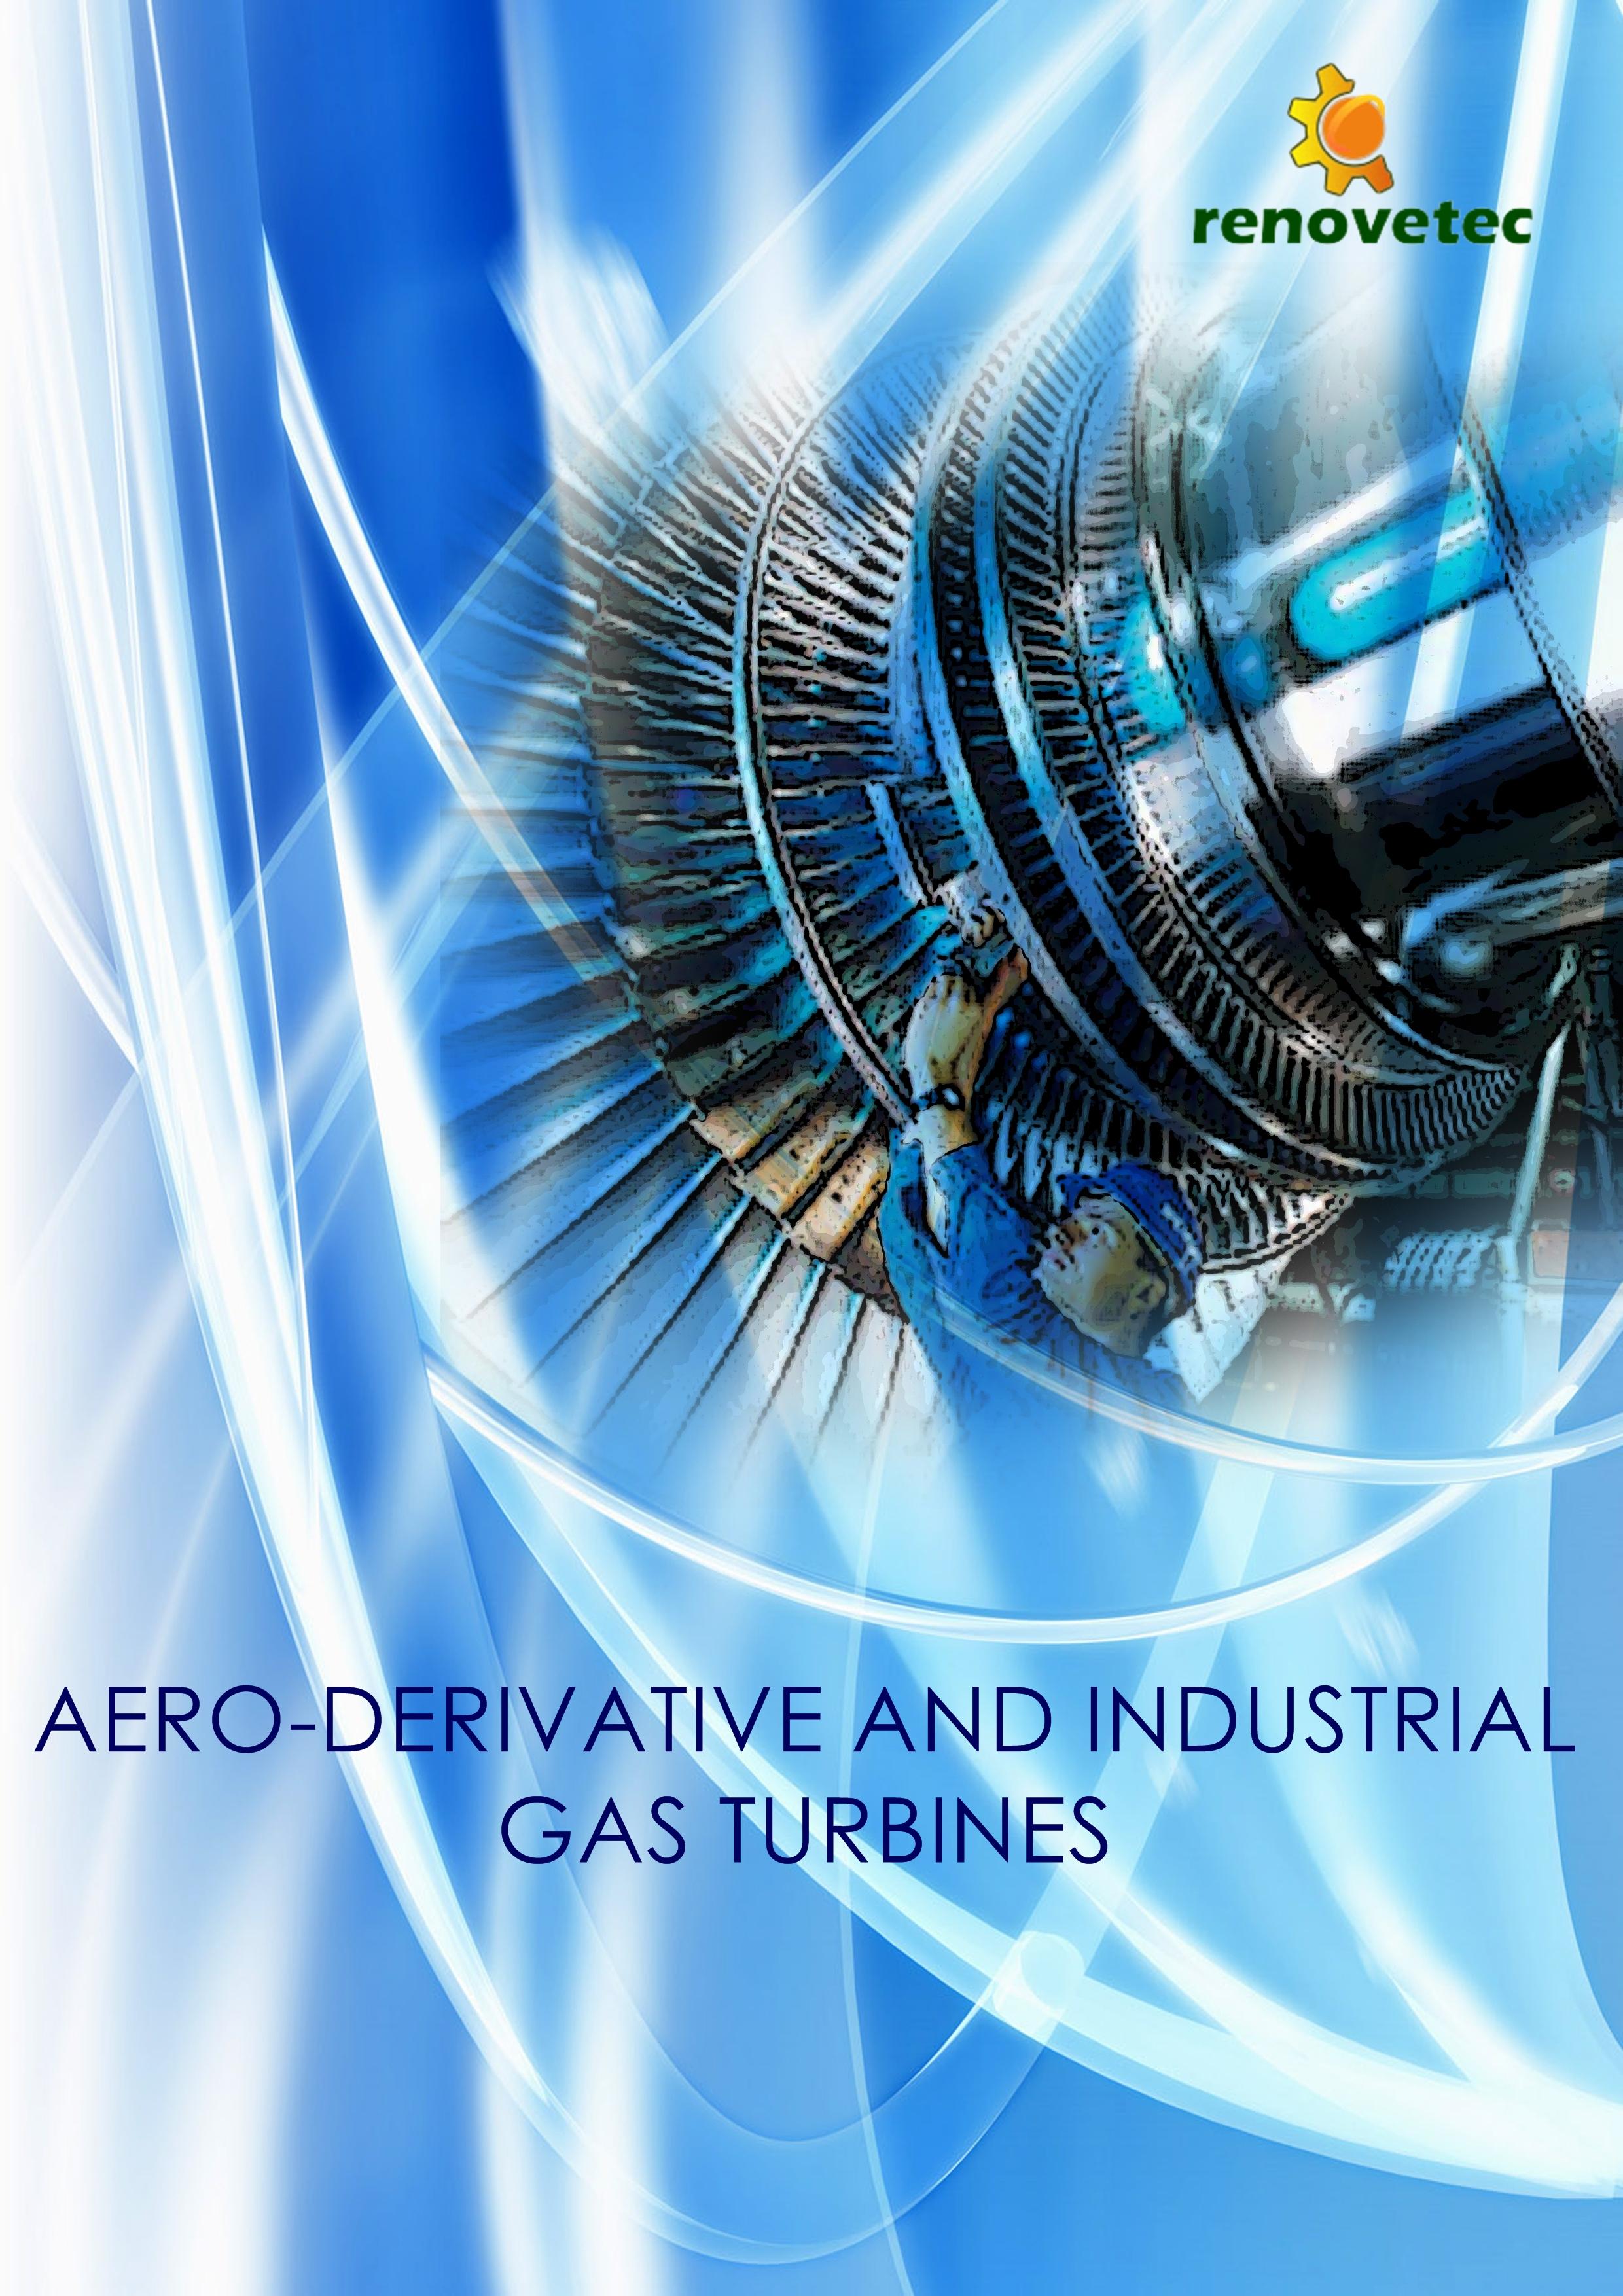 RENOVETEC Gas Turbines